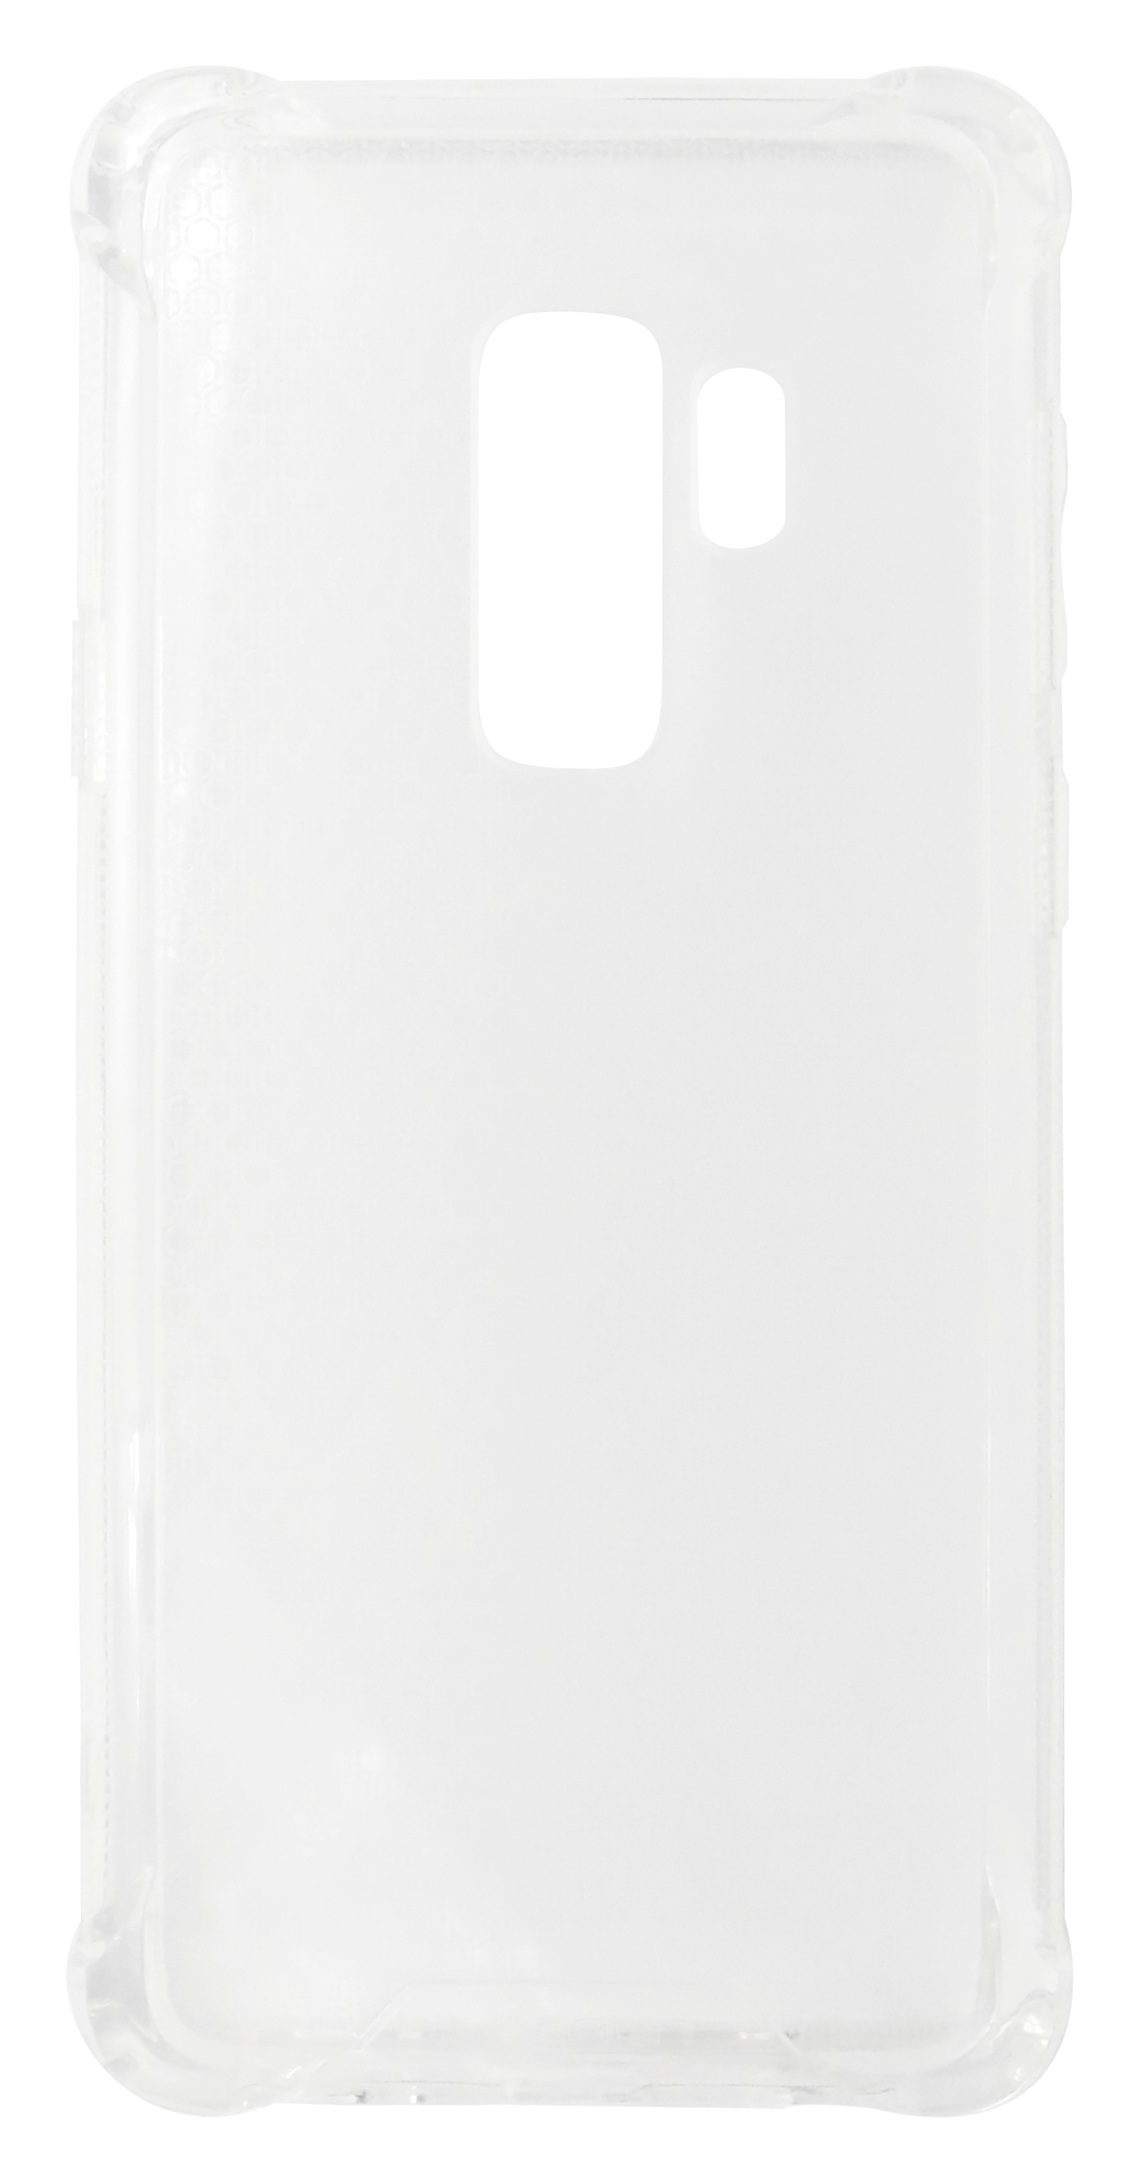 Husa tip capac spate Lensun cu colturi intarite plastic + silicon transparenta pentru Samsung Galaxy S9 Plus (G965)